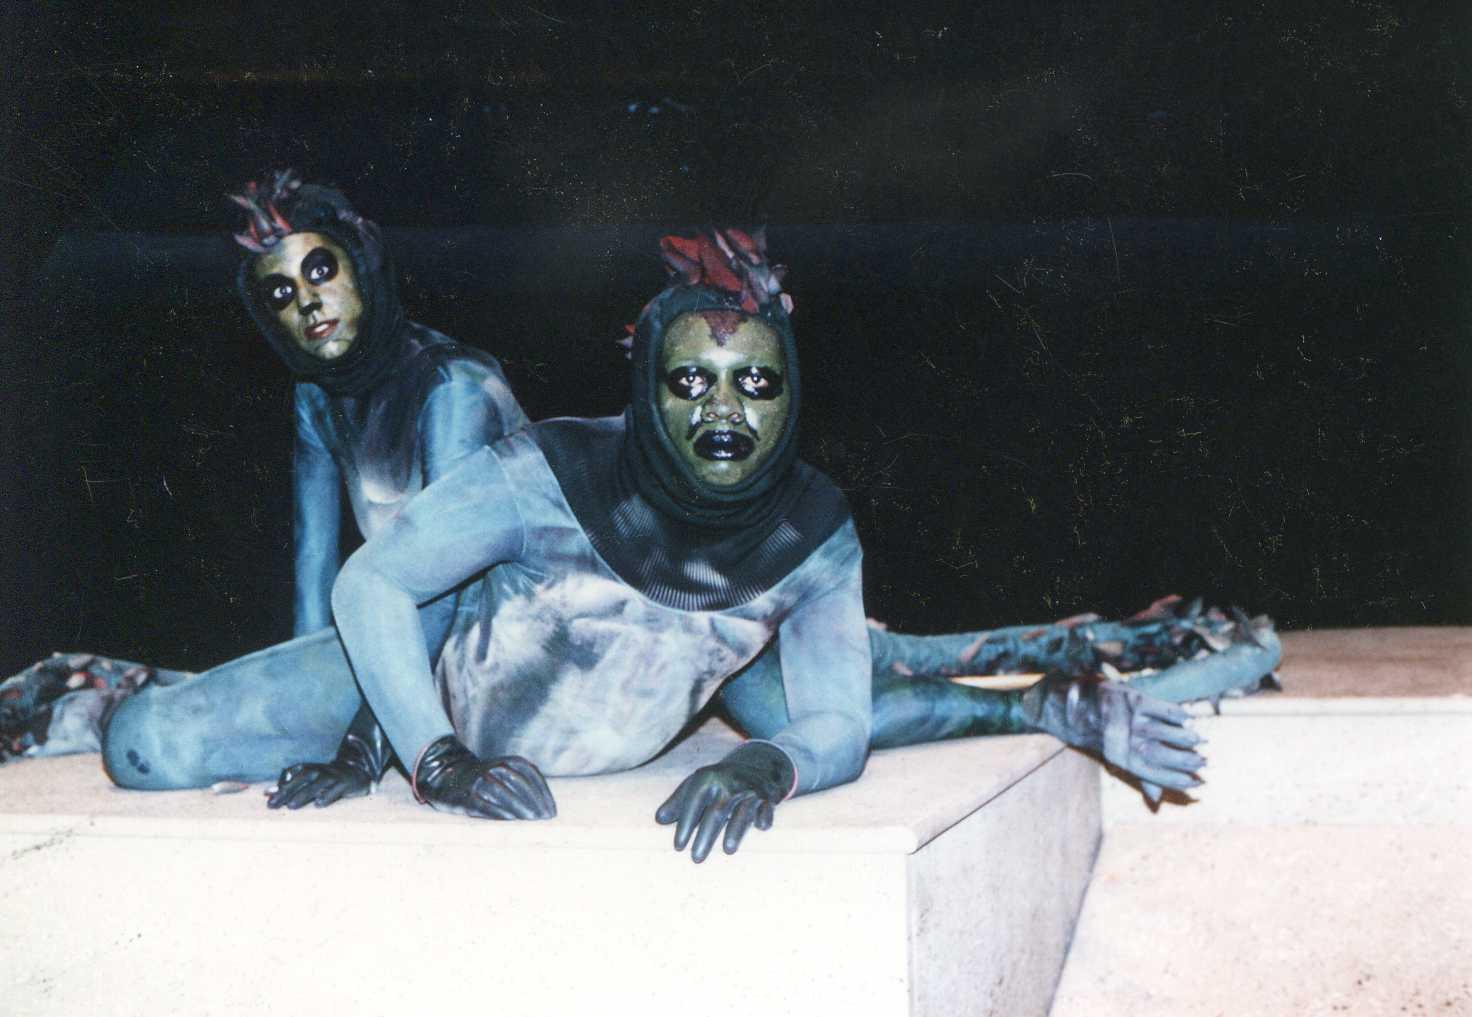 Bruce-Robinson-and-Lillian-Rozin-in-SEASCAPE-by-Edward-Albee-1988.jpg